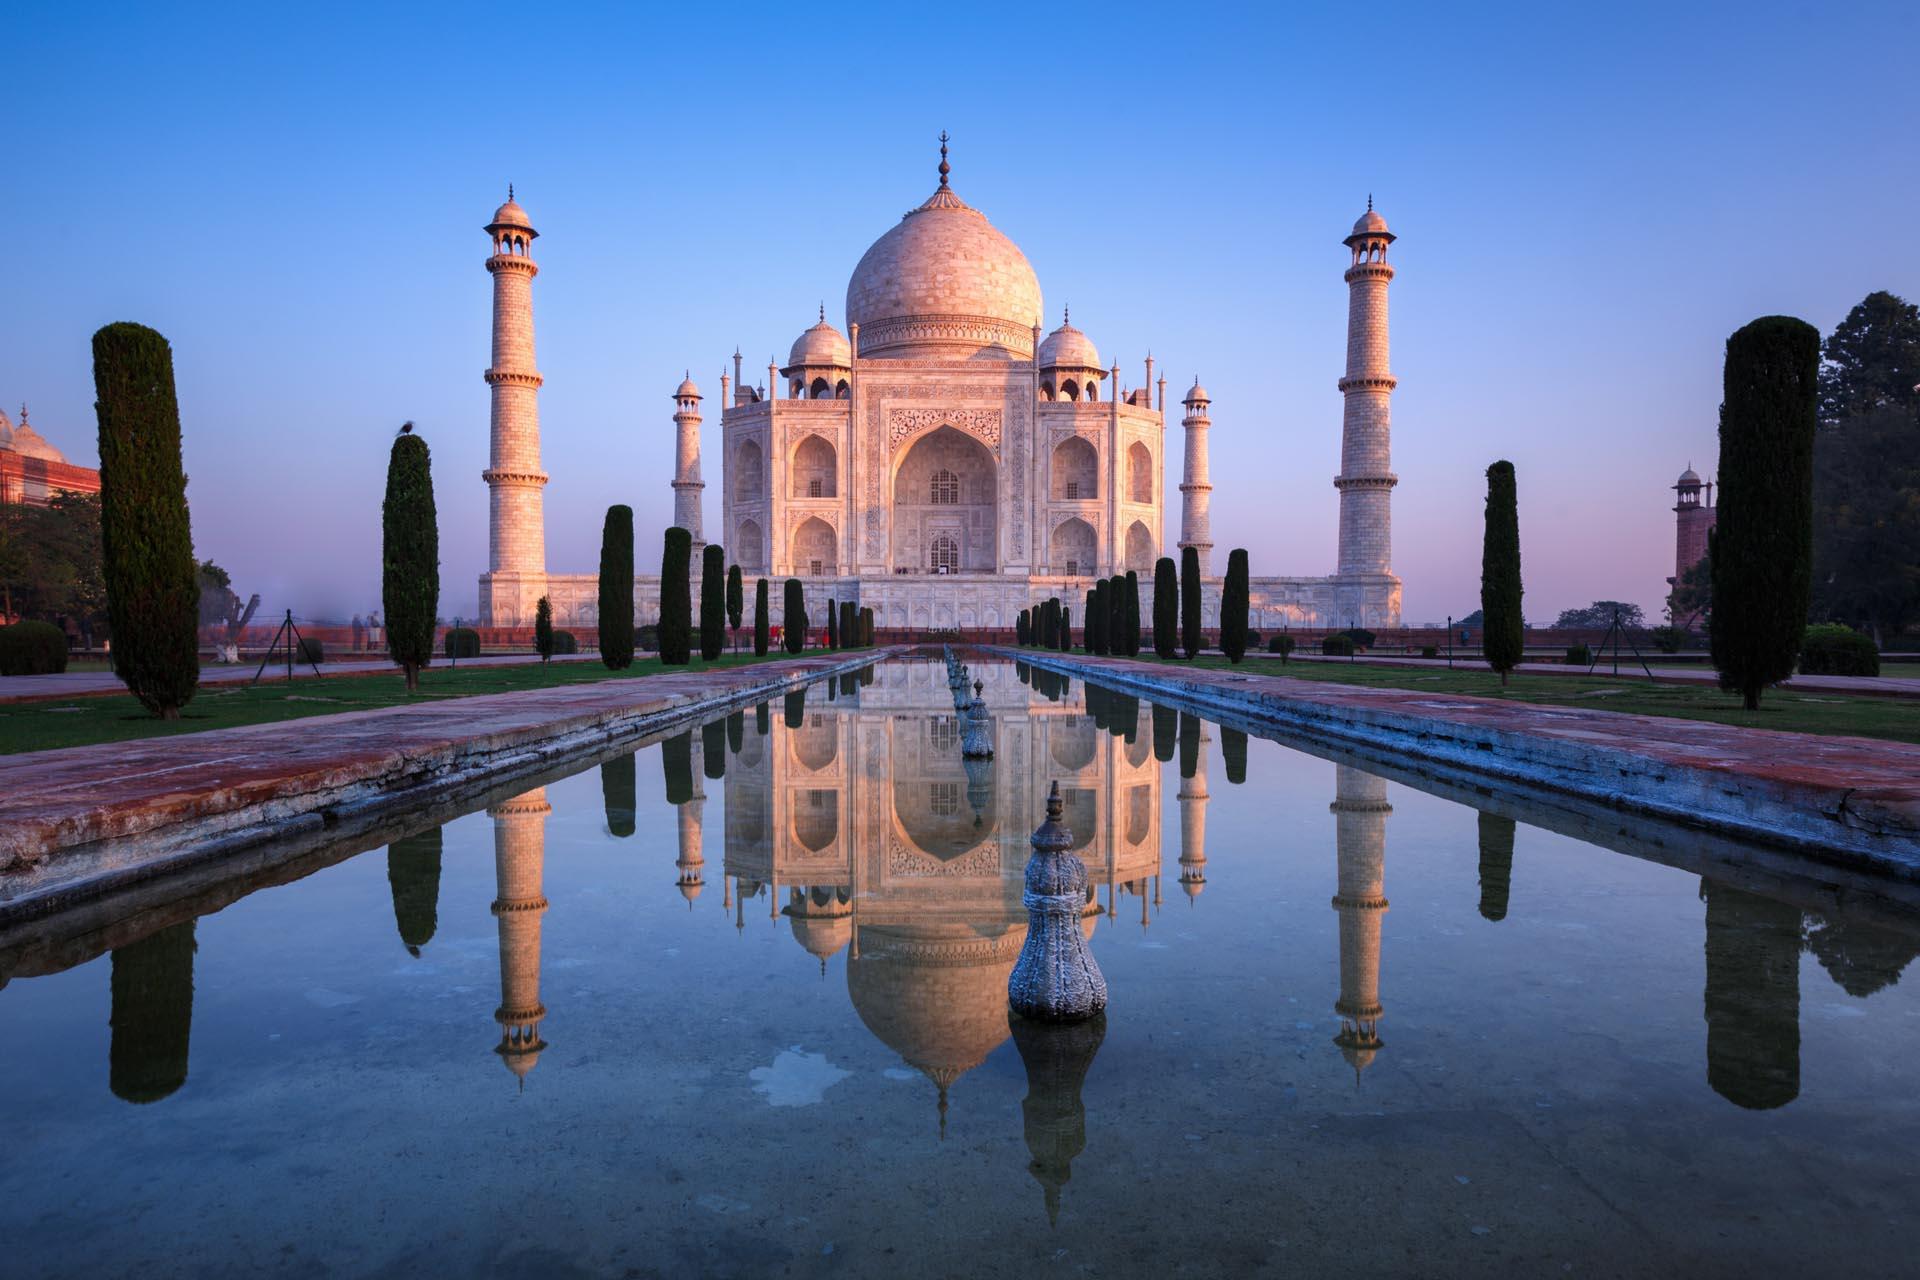 Marvel at the Taj Mahal in Agra, India